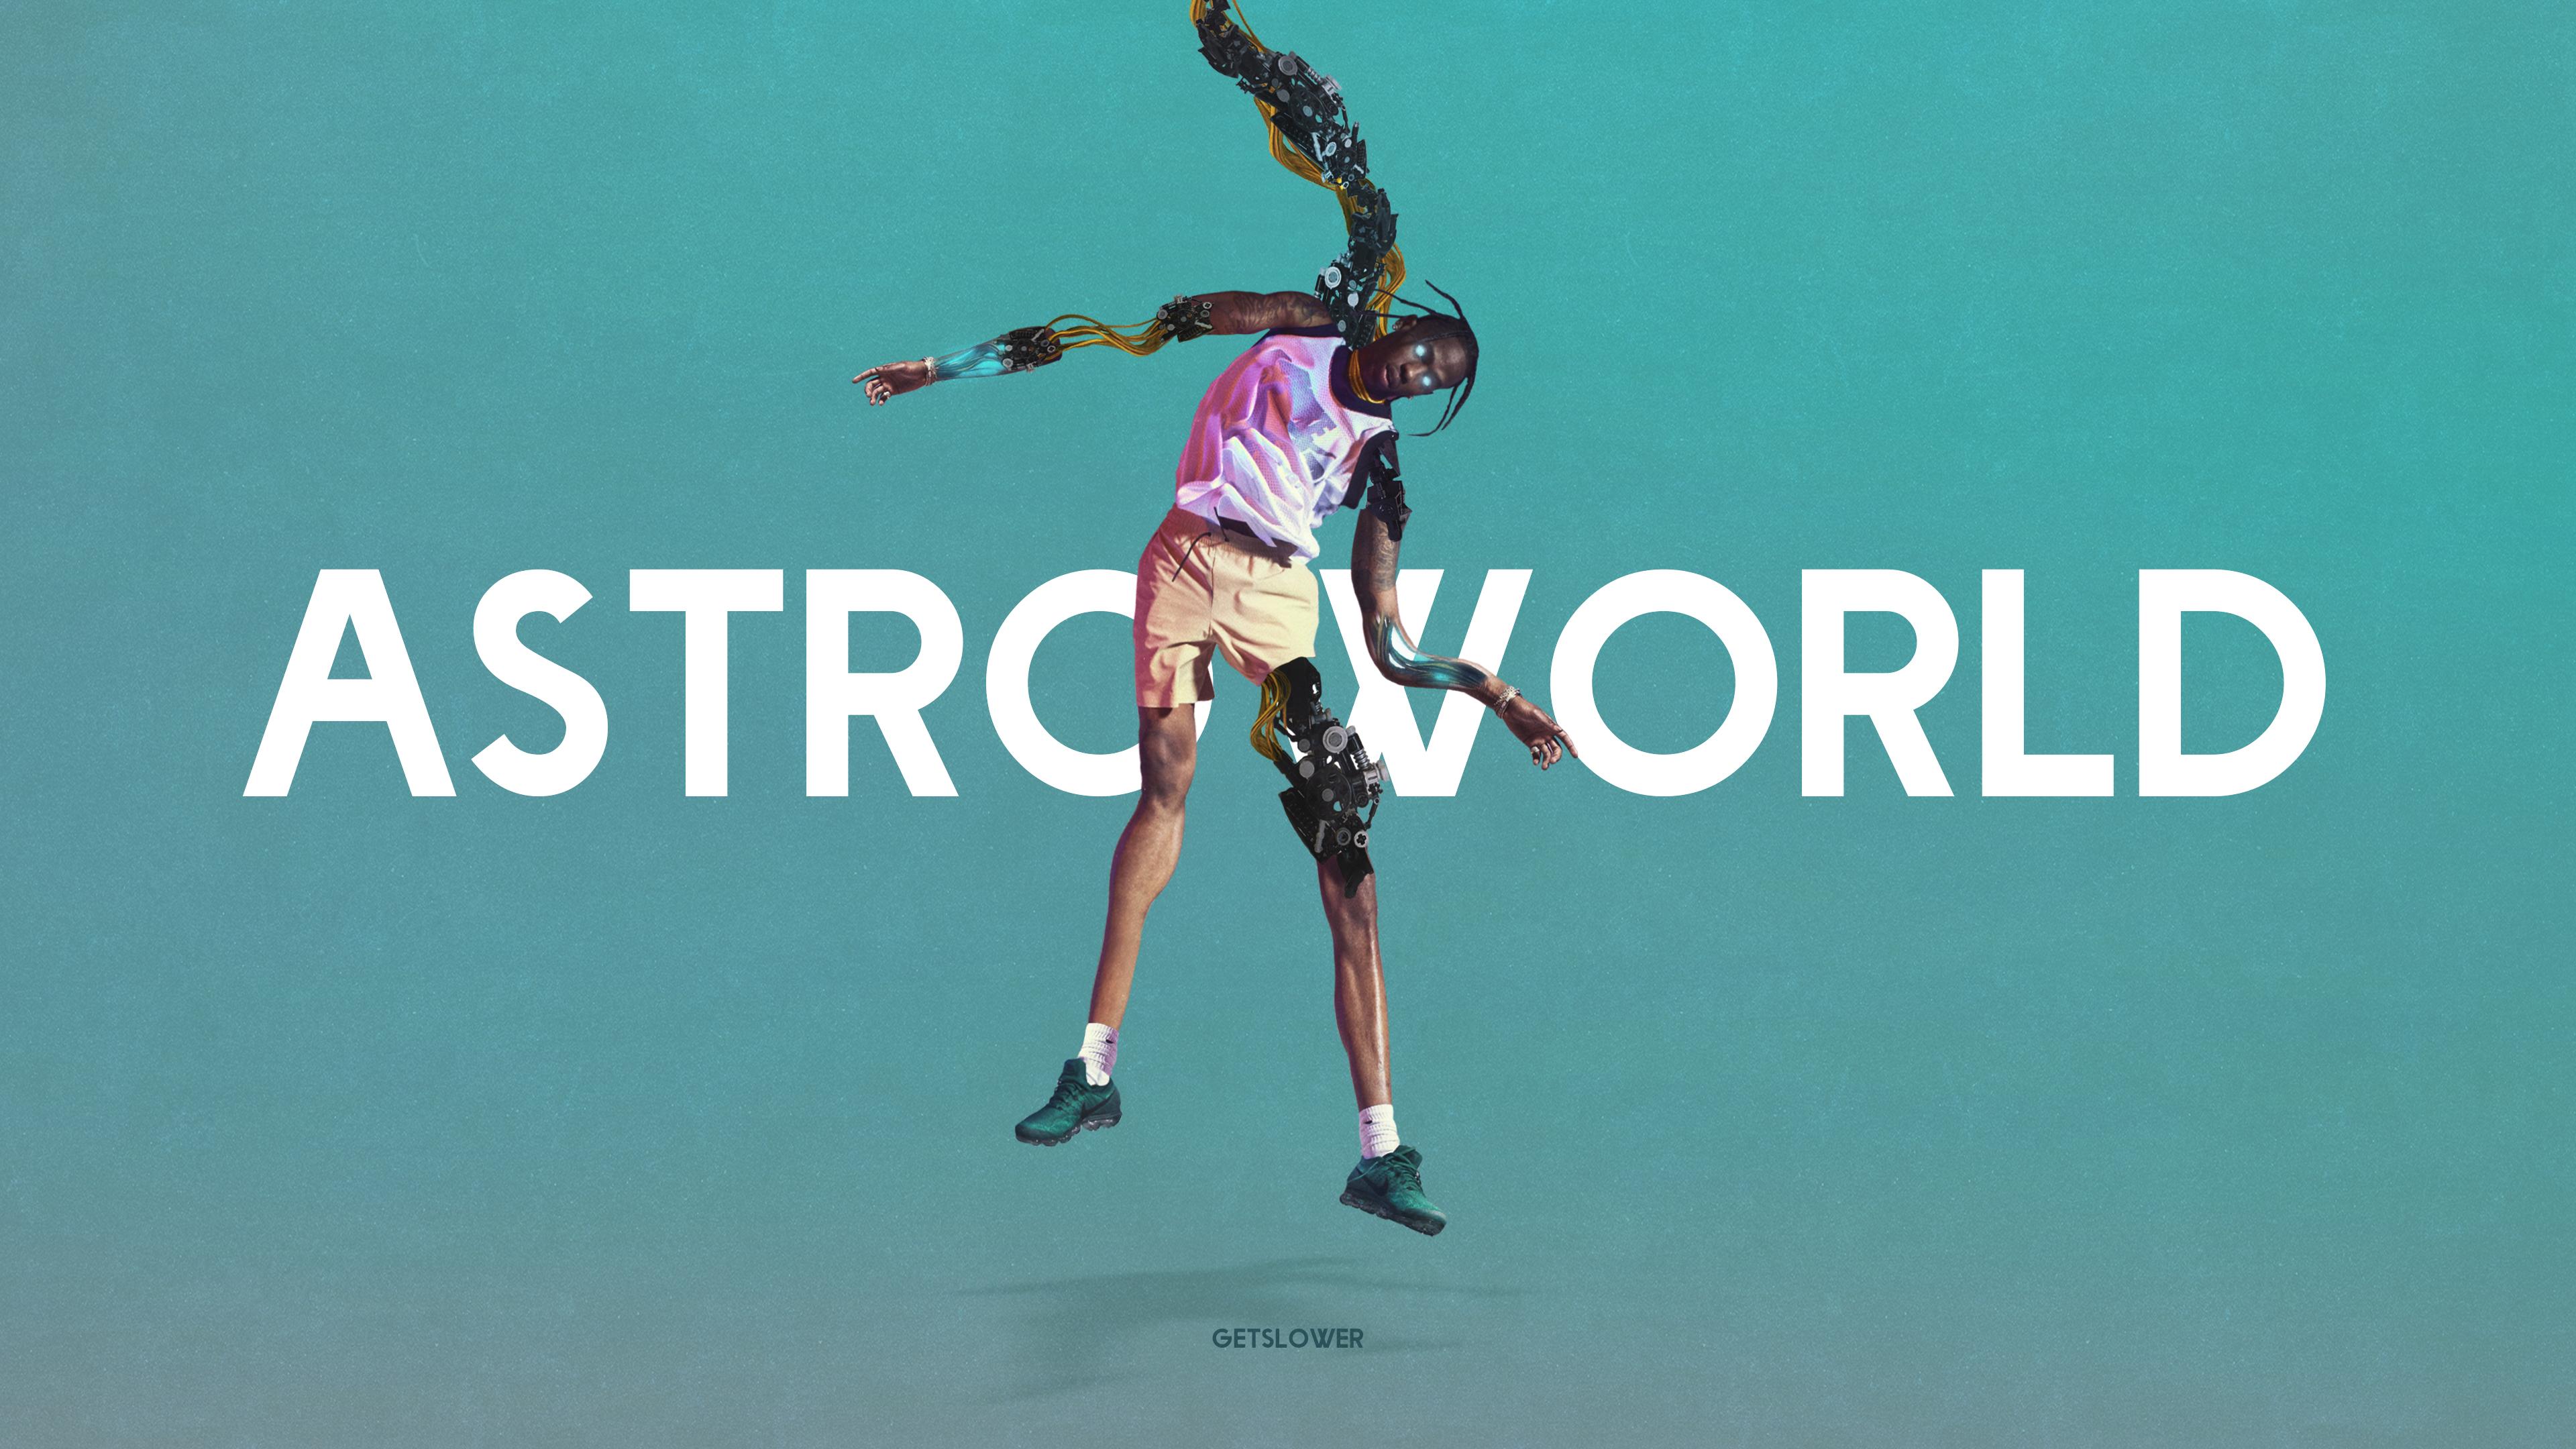 General 3840x2160 Travis Scott Kanye West digital art turquoise